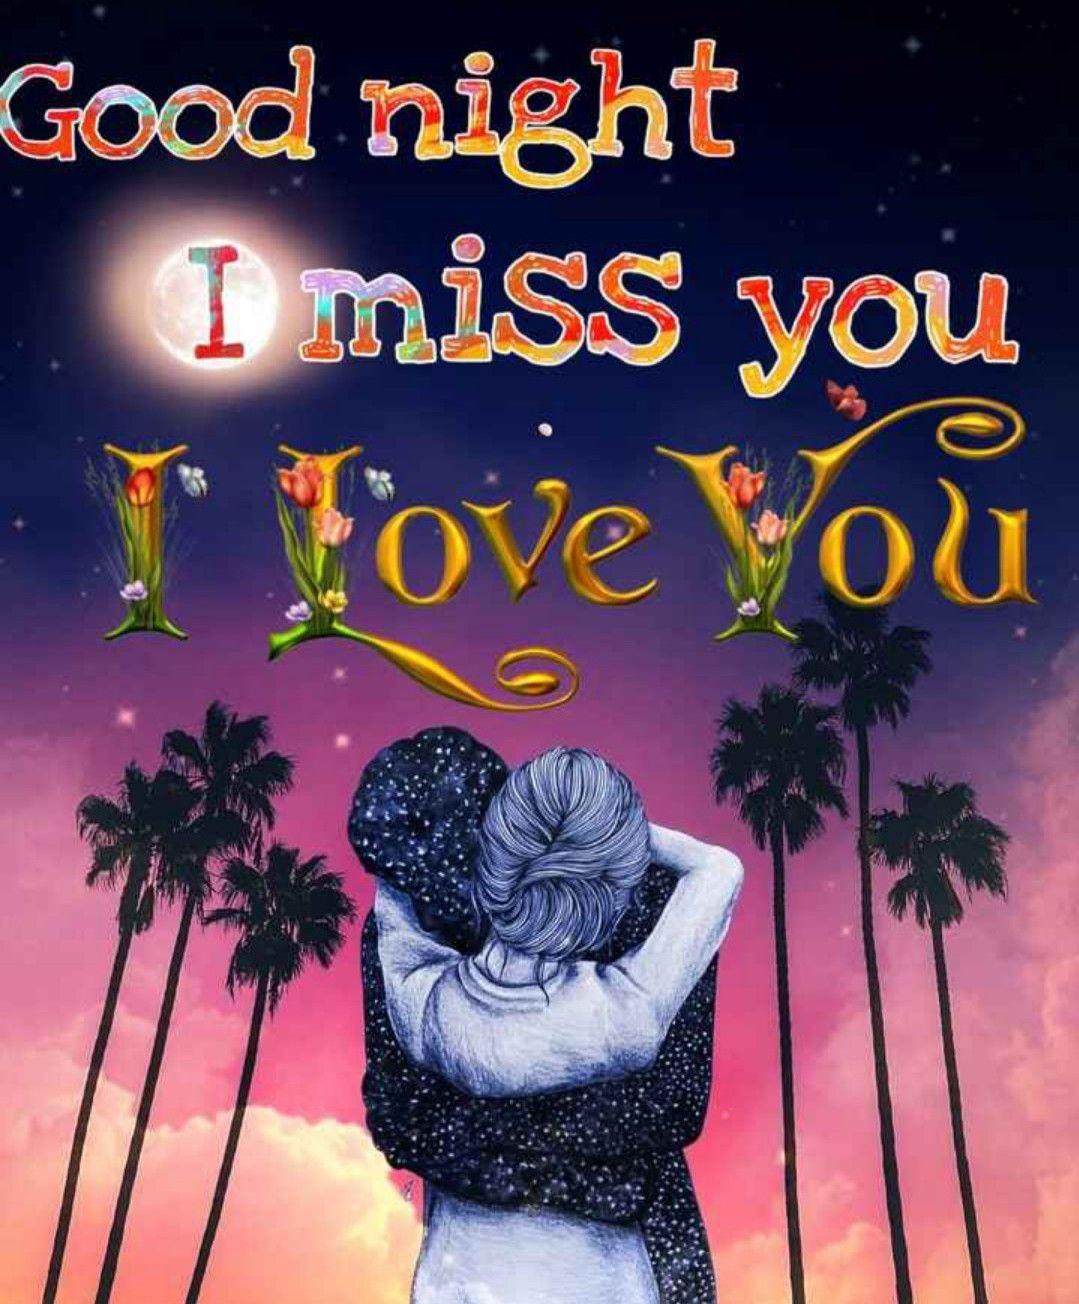 Pin By Aditi Kumari On Good Night Image Good Night Love Images Good Night Image Romantic Good Night 1080p good night sweet dreams images hd